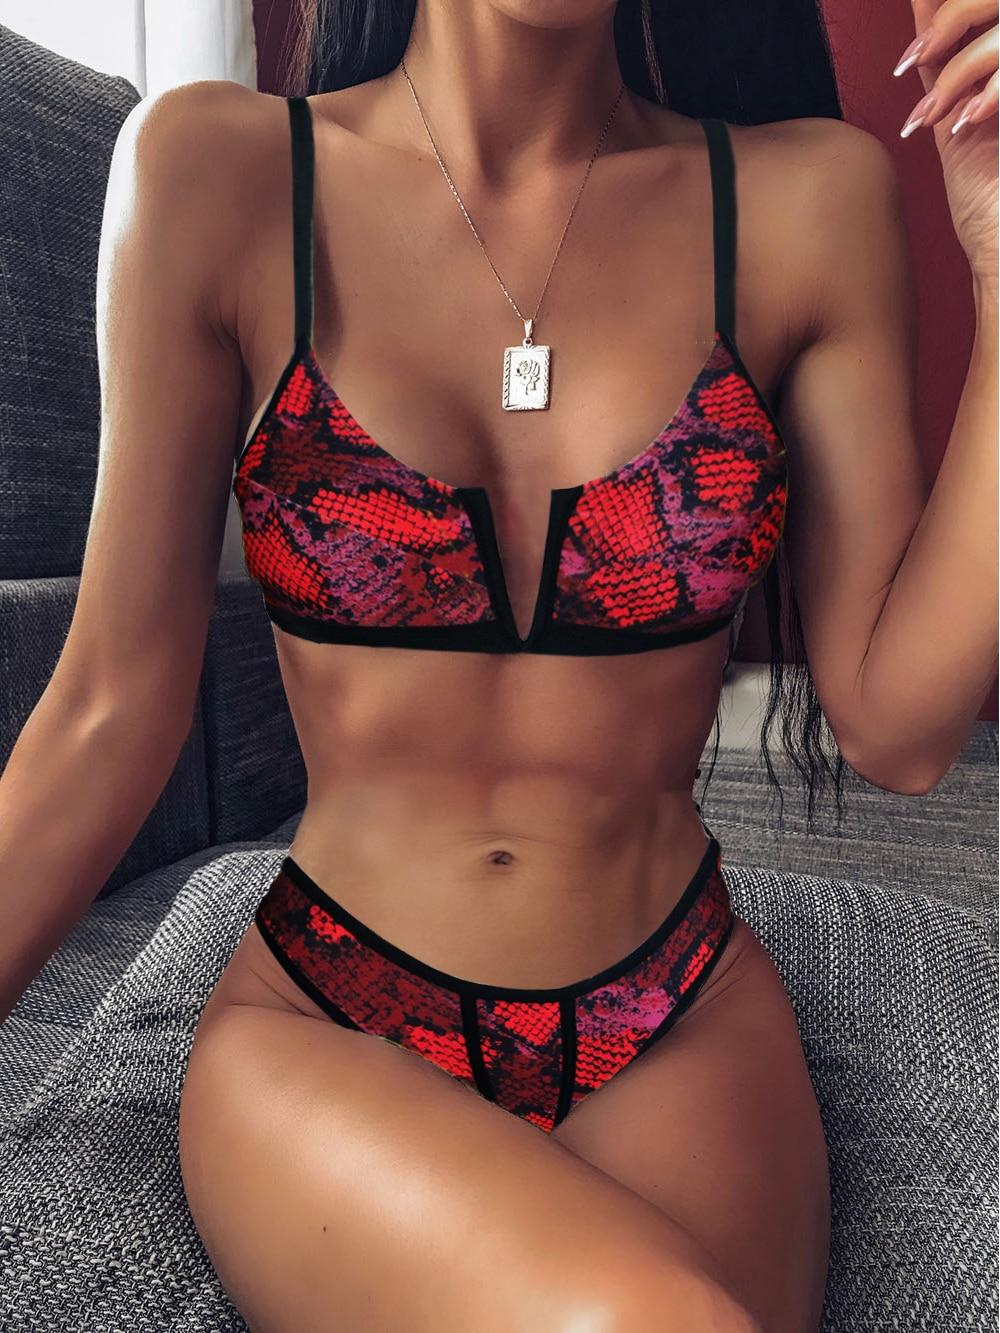 ALI shop ...  ... 32798124247 ... 3 ... 2019 New top sexy solid swimwear push up bikini bandage sport suit high cut bathing suit bandeau swimsuit women bikini set 2507 ...